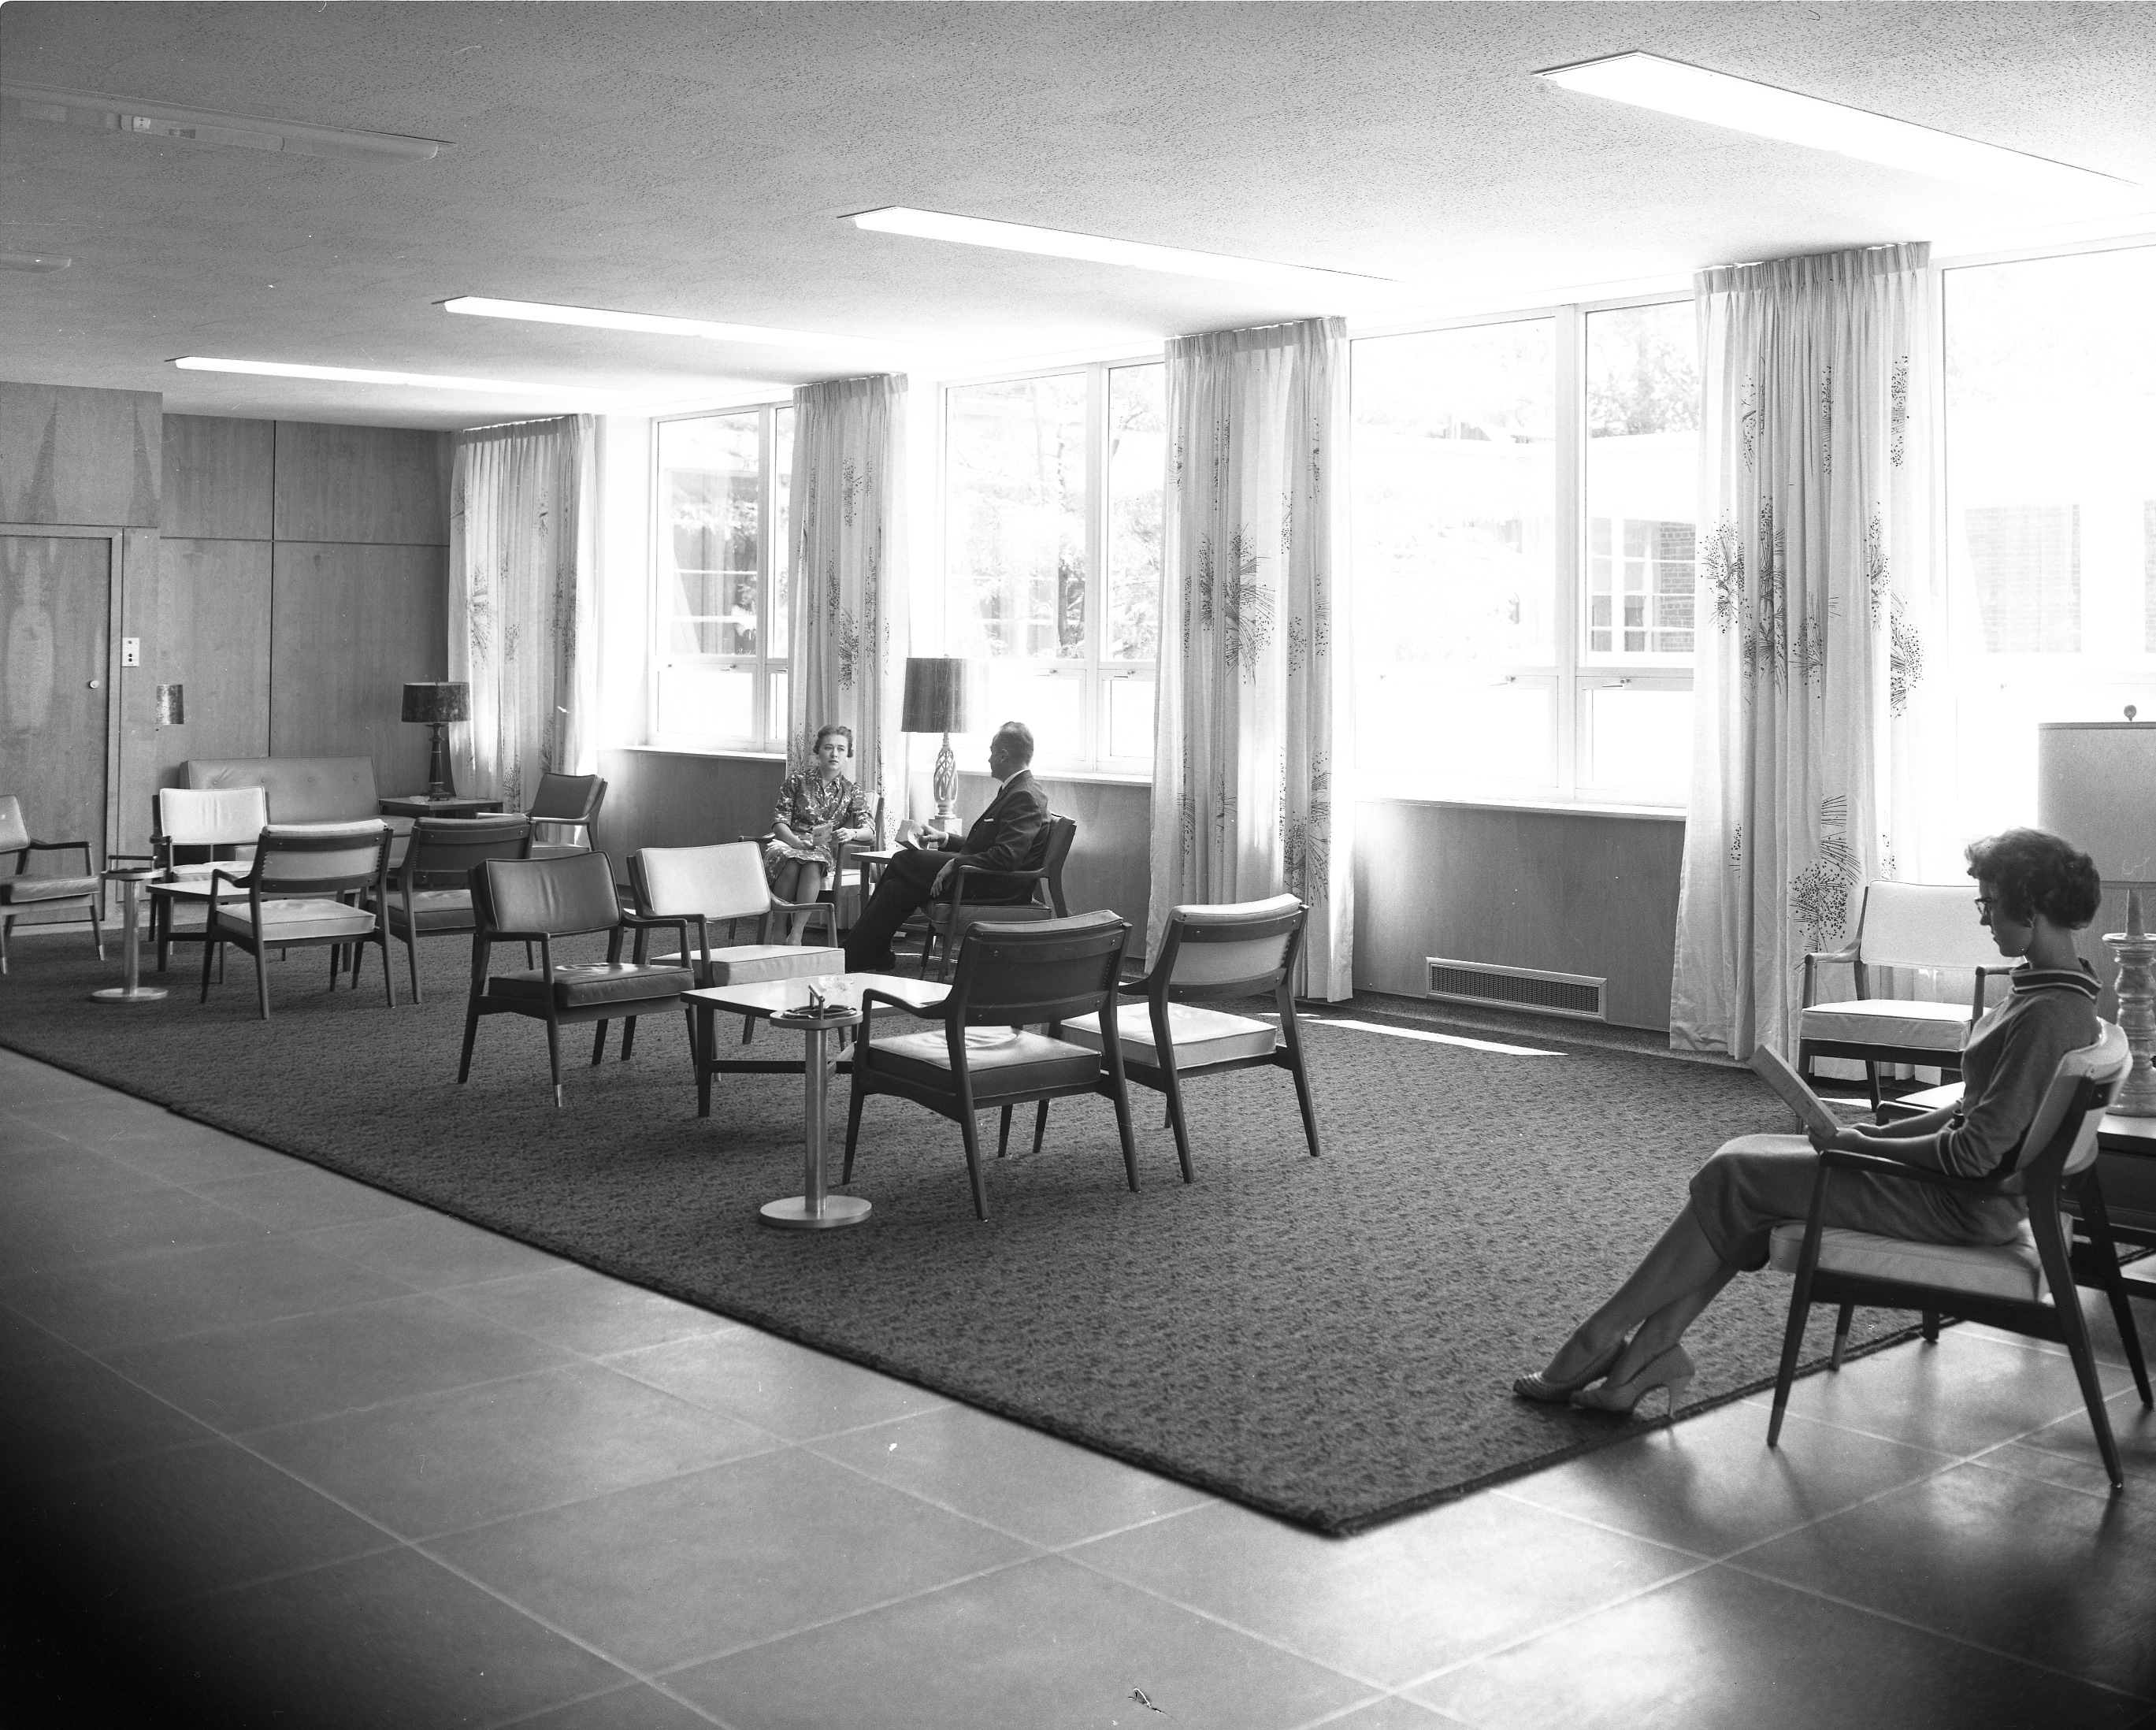 Lounge at the Kellogg Center, 1959.